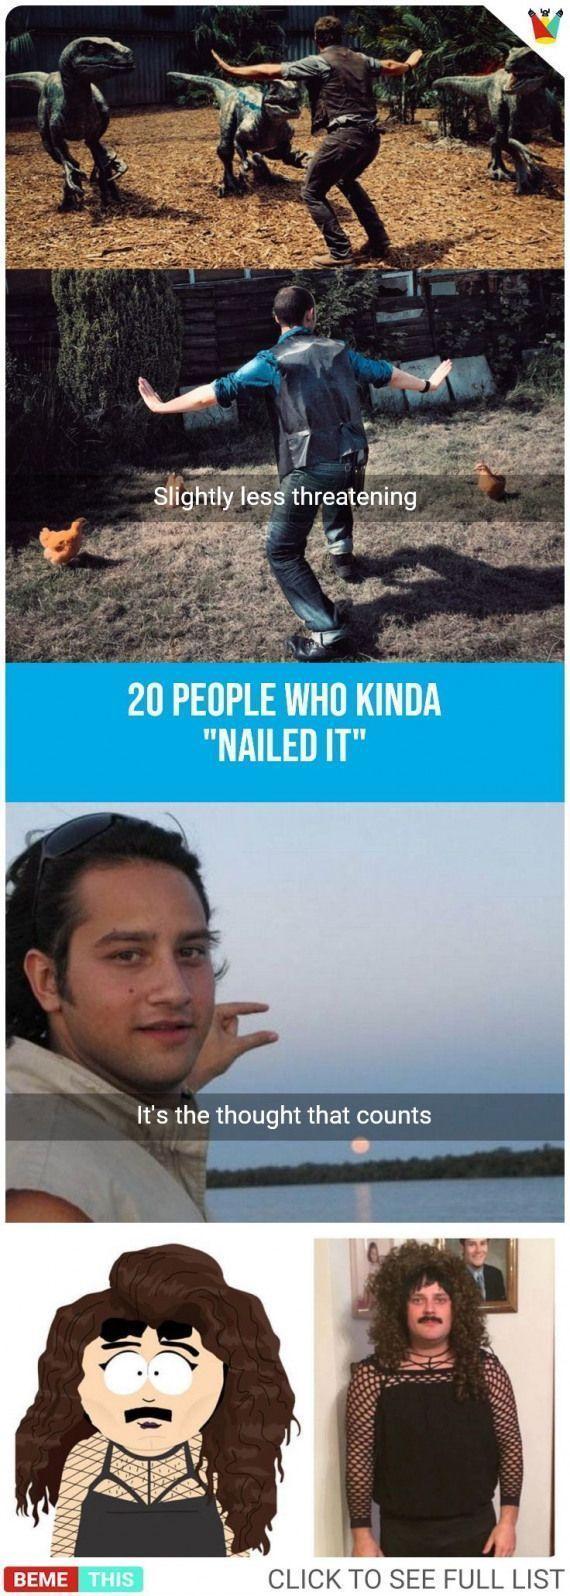 20 People Who Kinda Nailed it it Humor it Humor it Humor it Humor it Humor